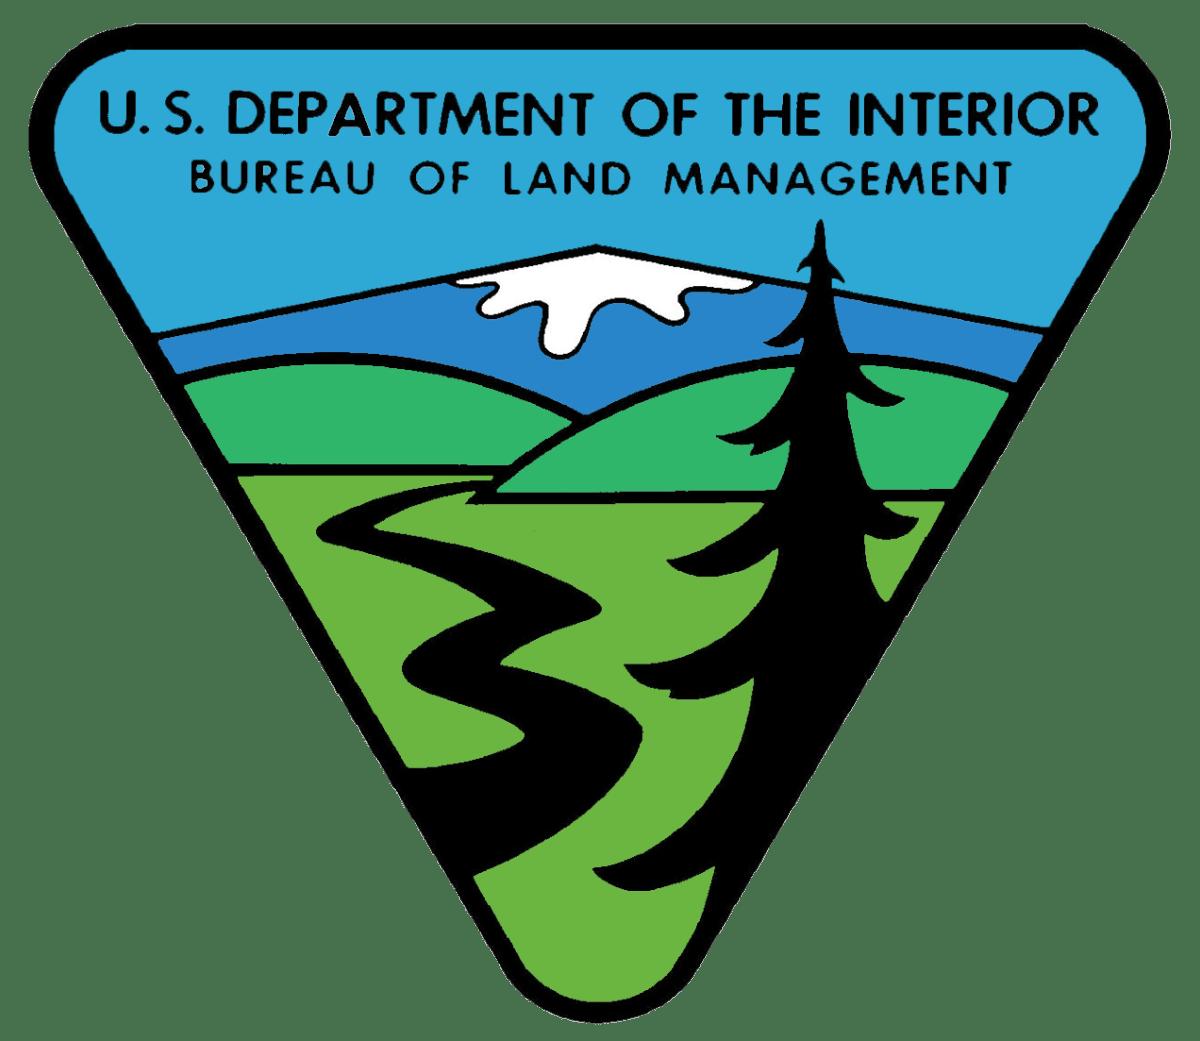 bureaulandmanagement